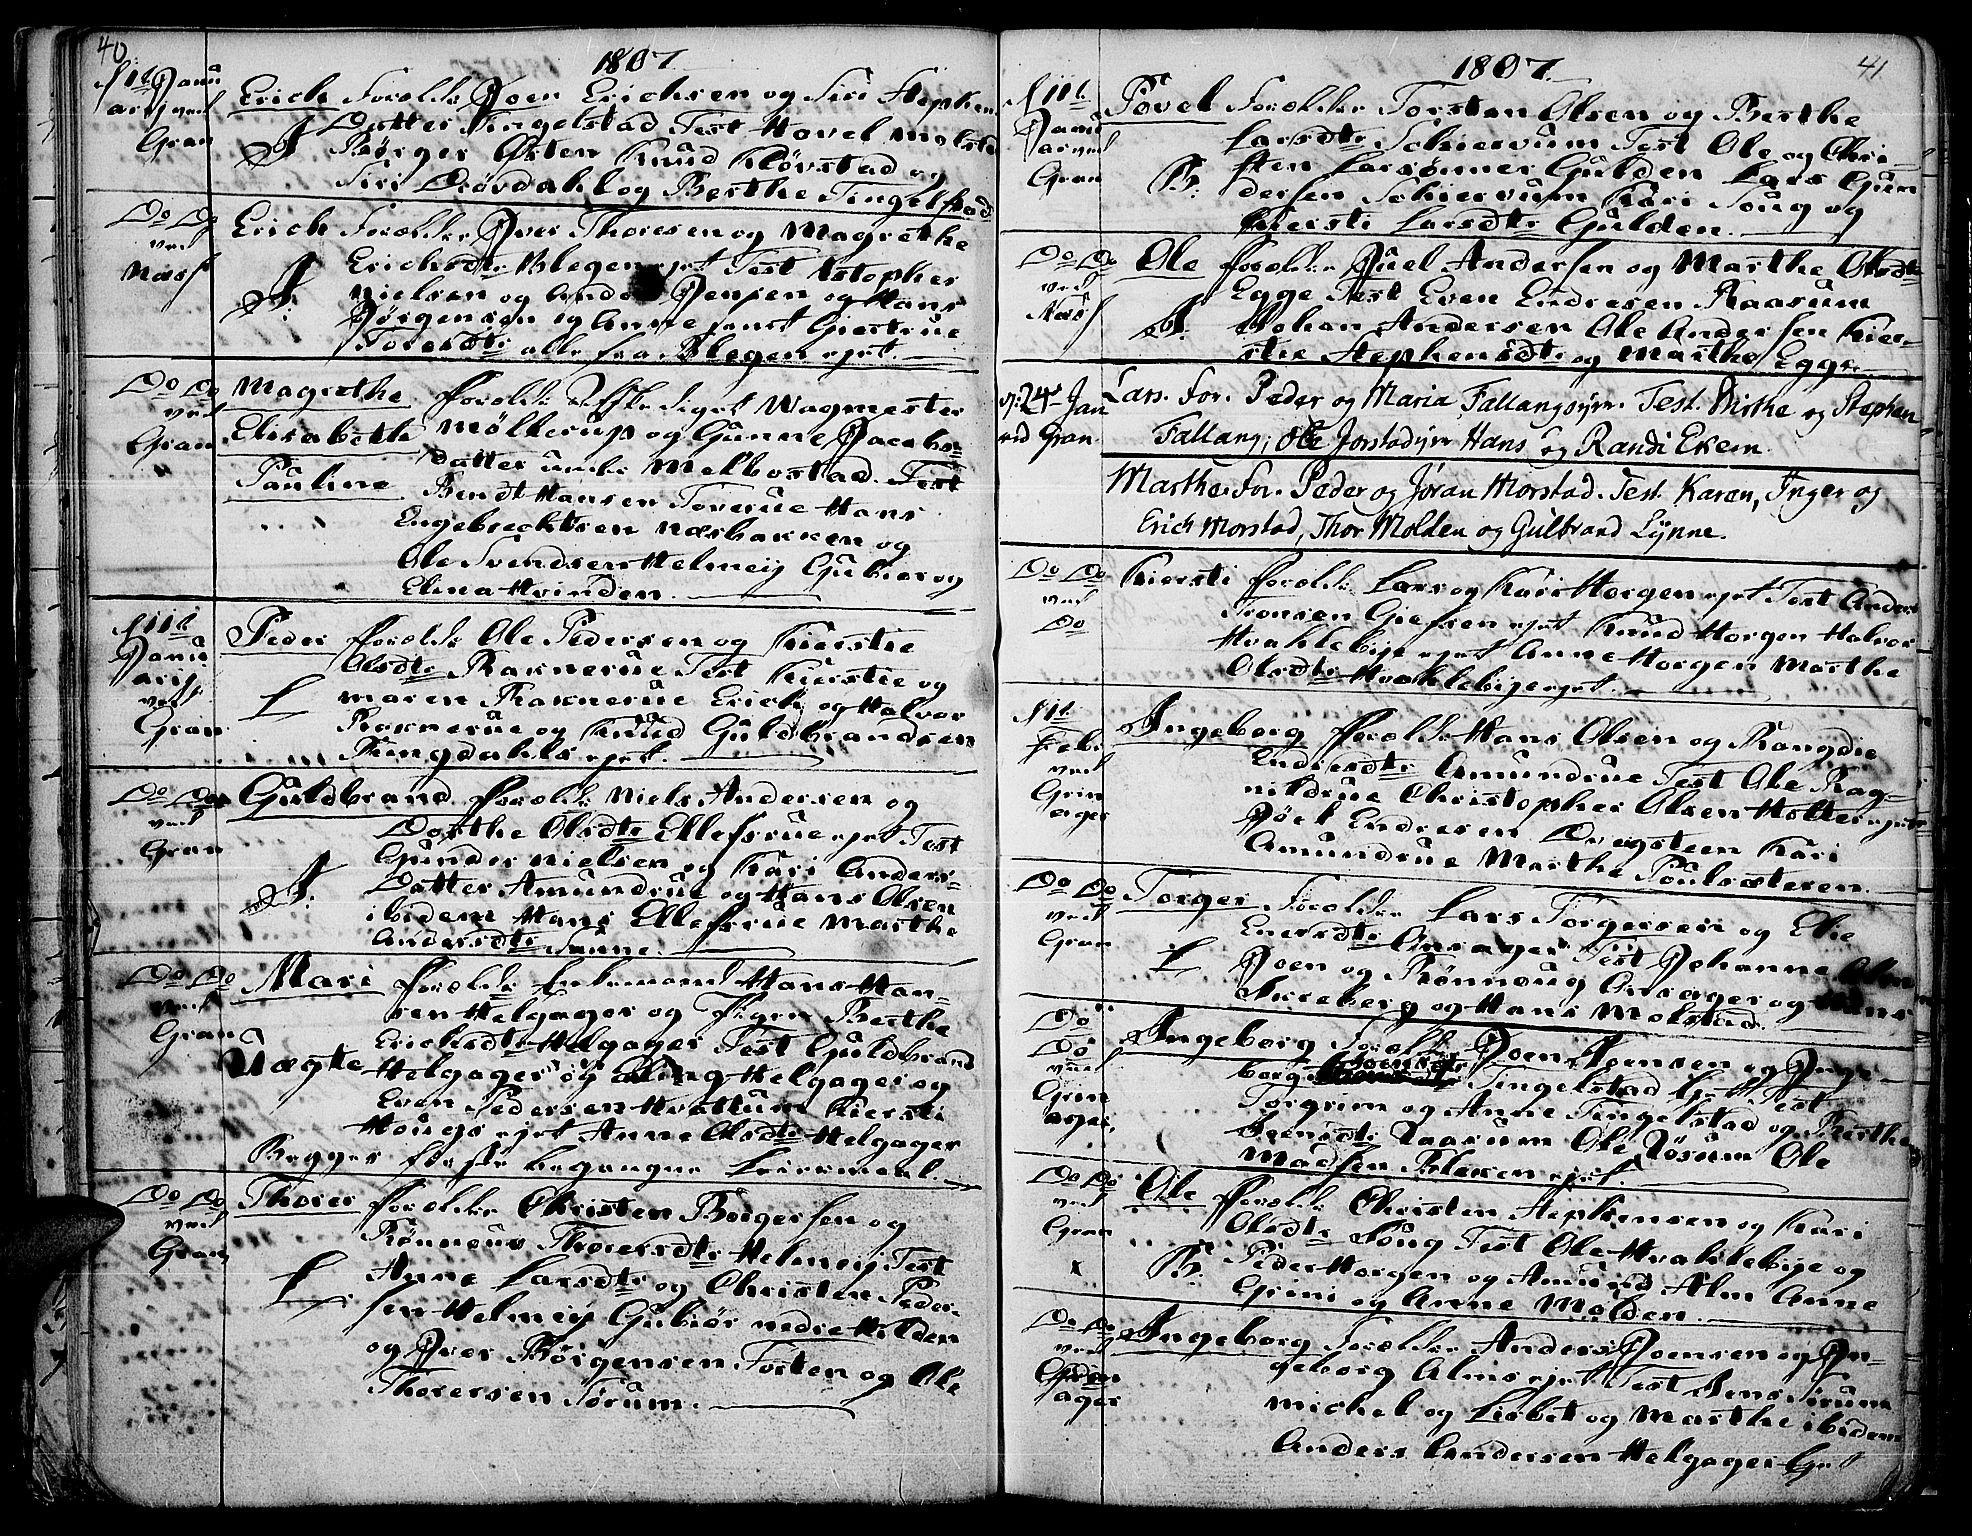 SAH, Gran prestekontor, Ministerialbok nr. 7, 1804-1815, s. 40-41